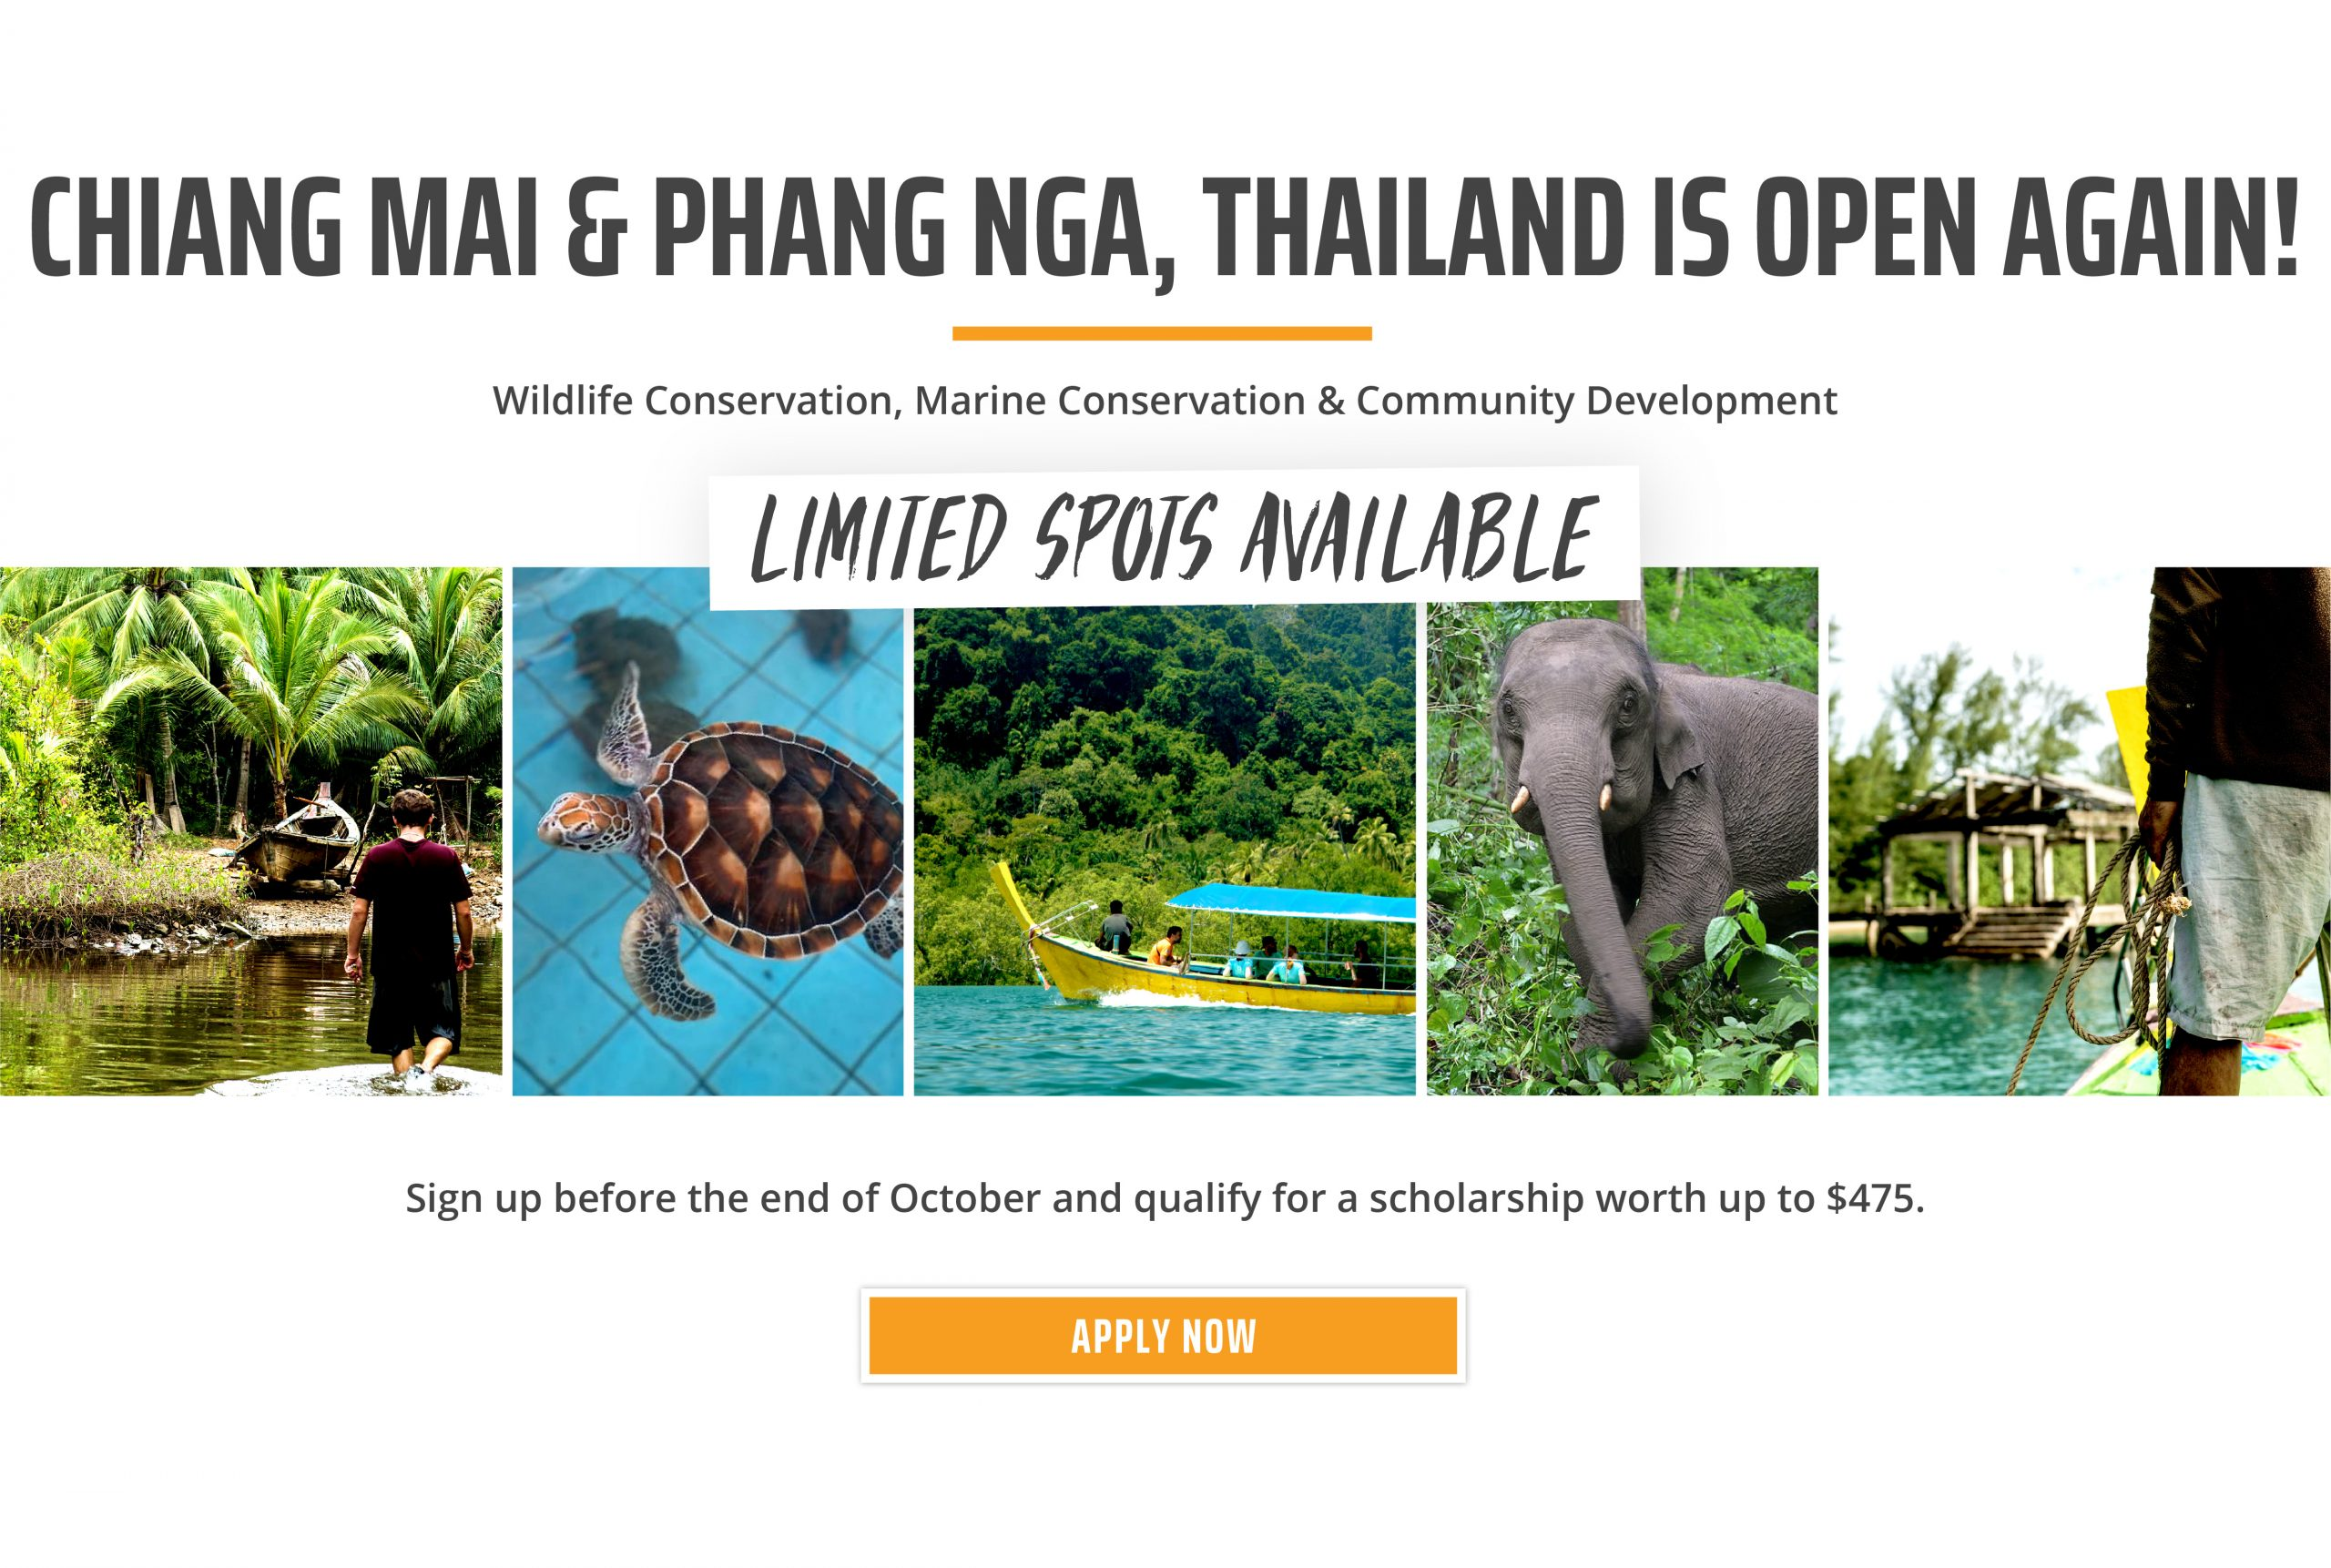 USA Thailand Reopening